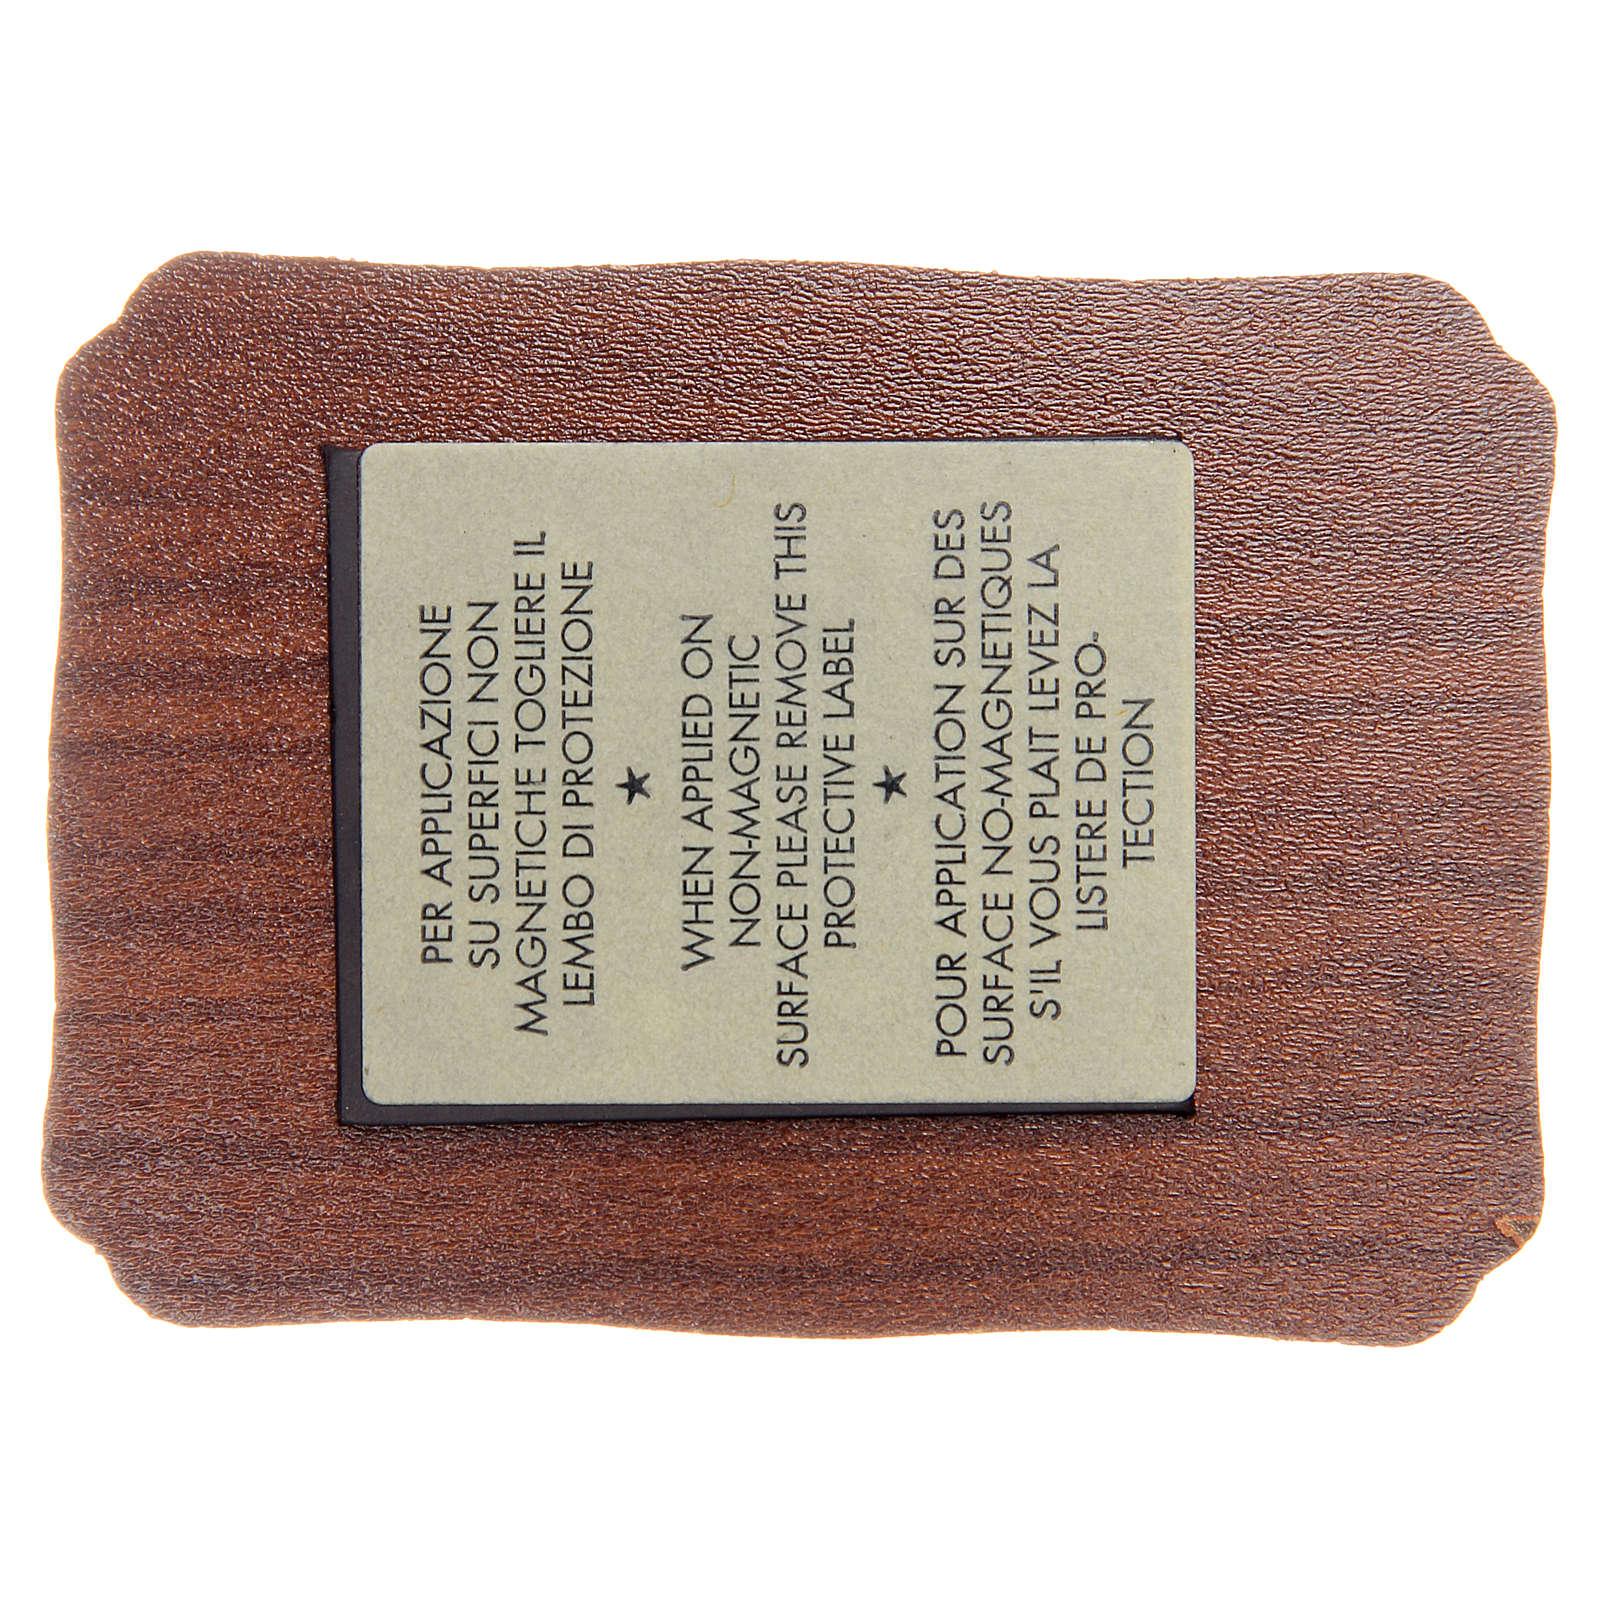 STOCK Imán 3 Papas madera pergamino cm 8x5,5 FRANCÉS 3